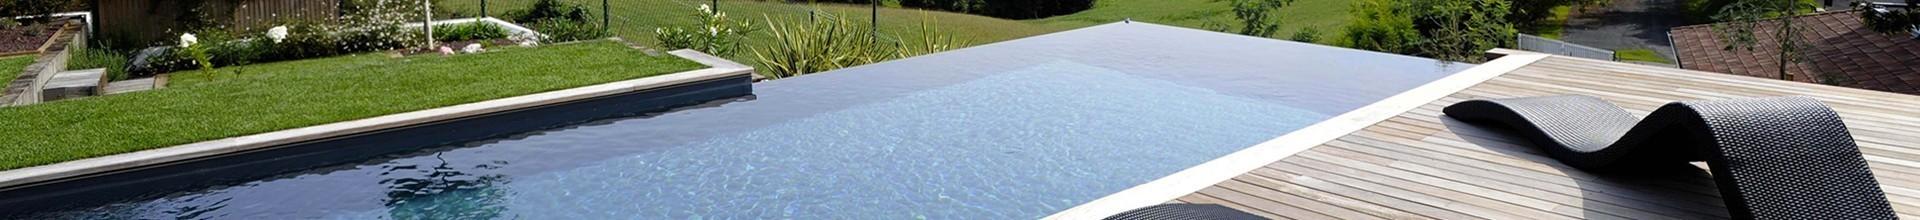 Direct usine, piscine coque prix Pays : Luxembourg